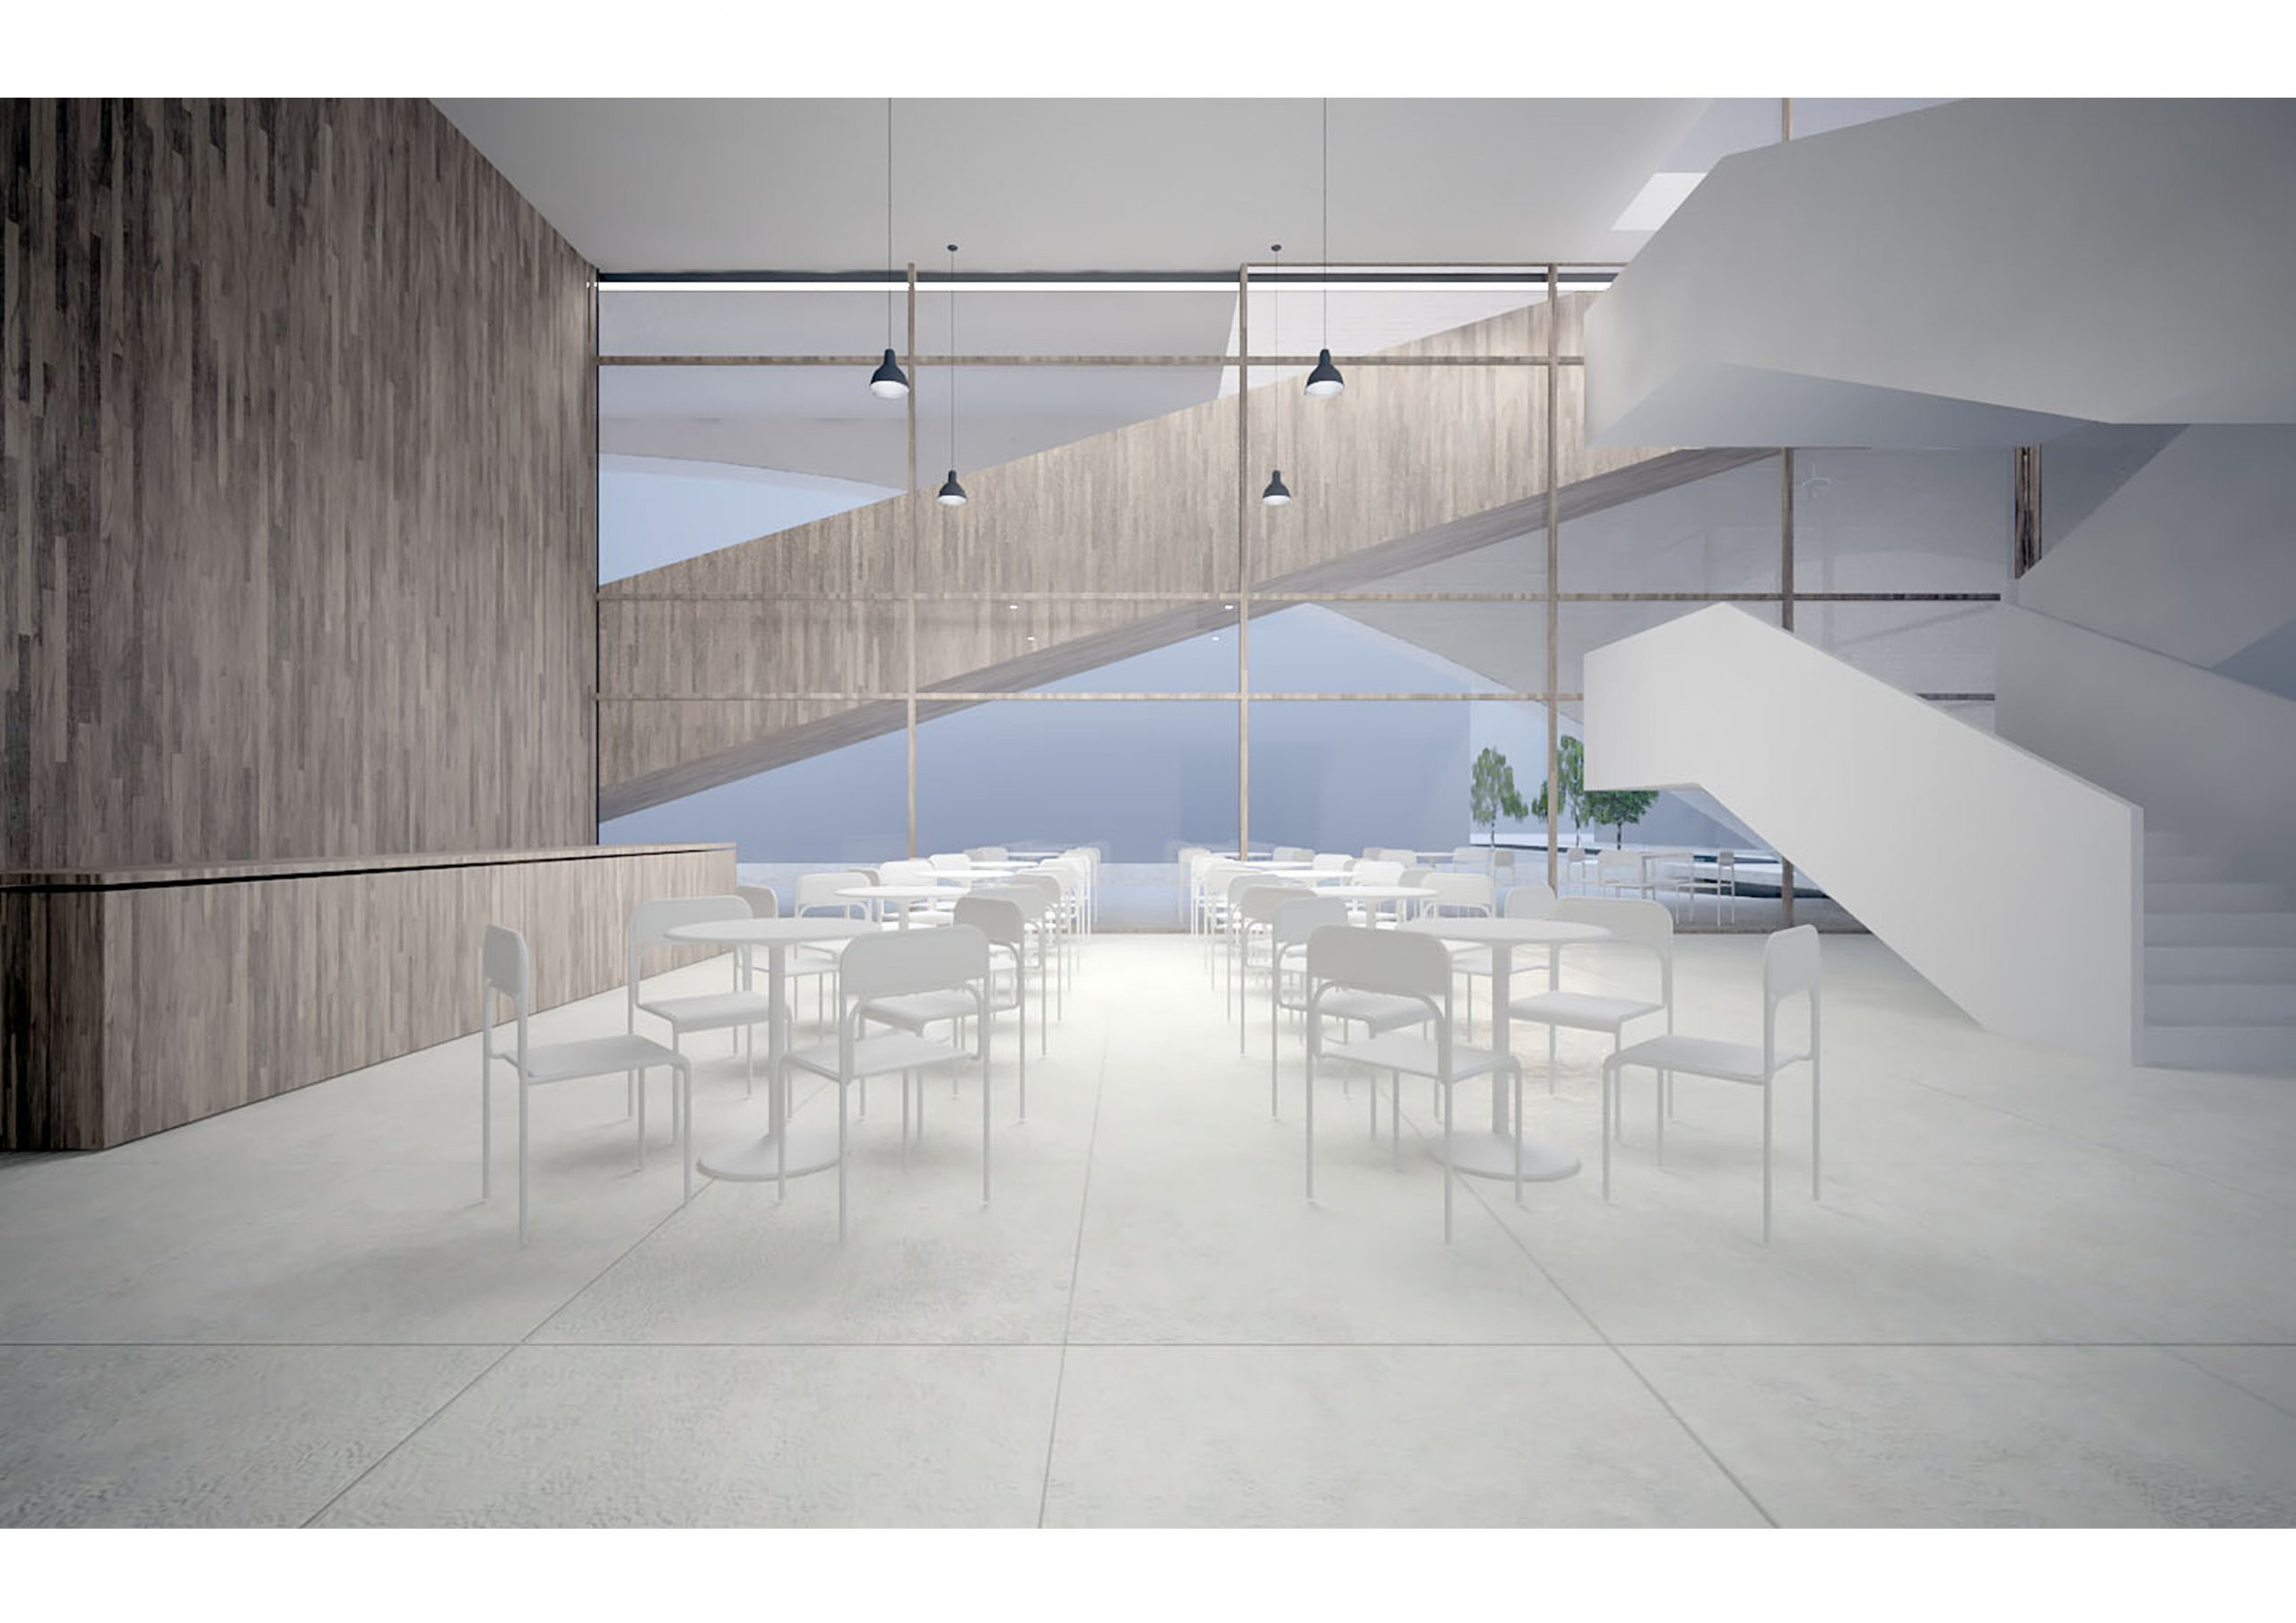 https://nbc-arhitect.ro/wp-content/uploads/2020/10/NBC-Arhitect-_-public-buildings-_-Protestant-Church-_-Copenhagen-_-interior-view_2-scaled.jpg